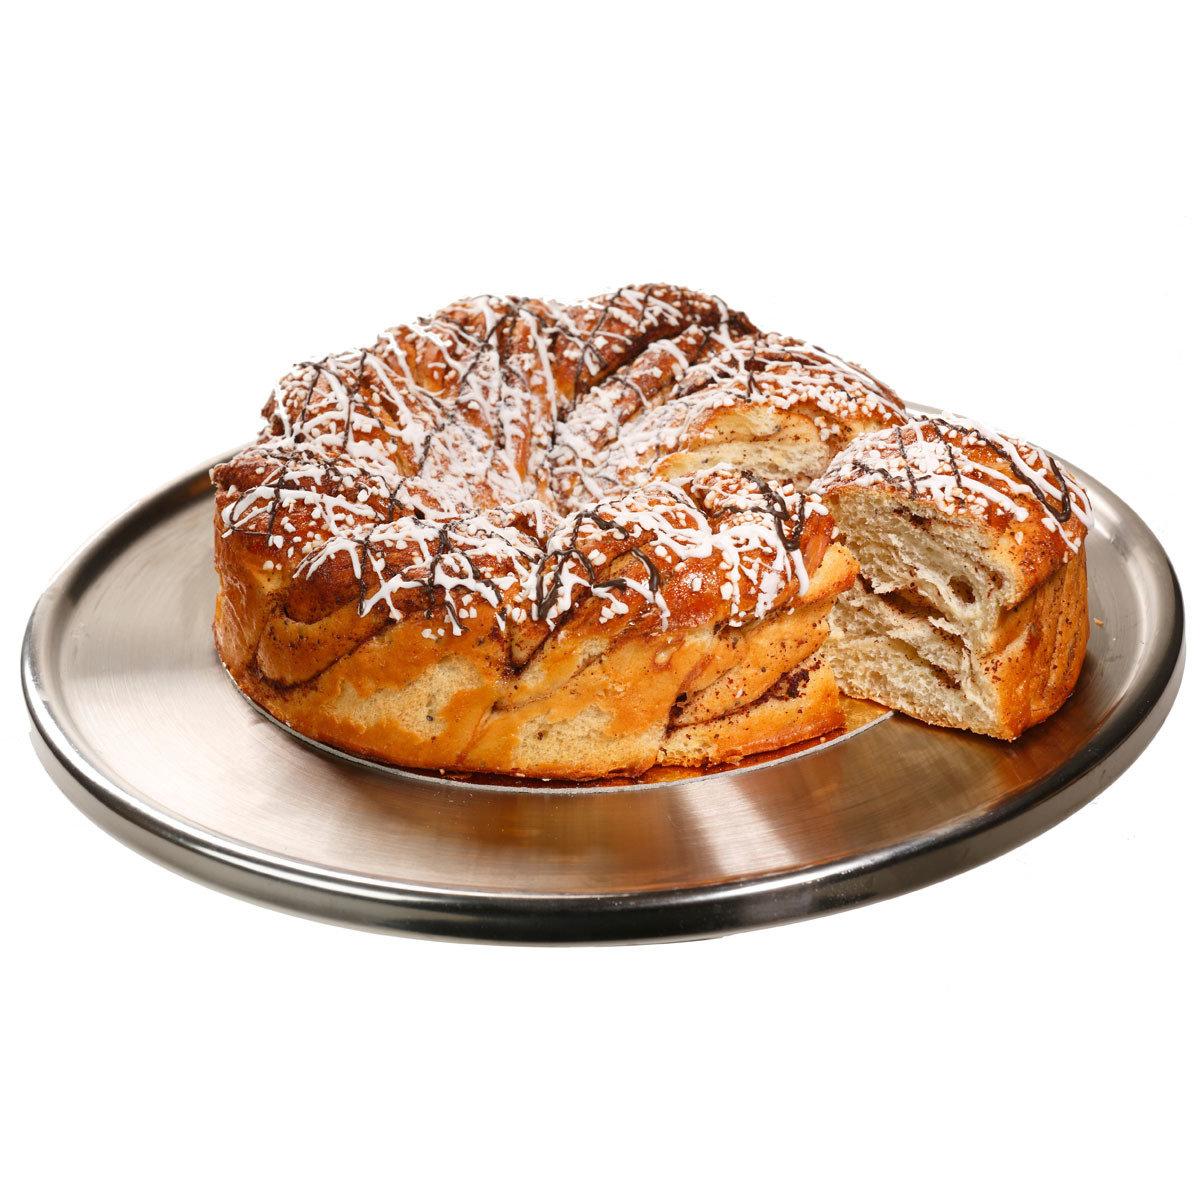 Bostonpulla bakery048